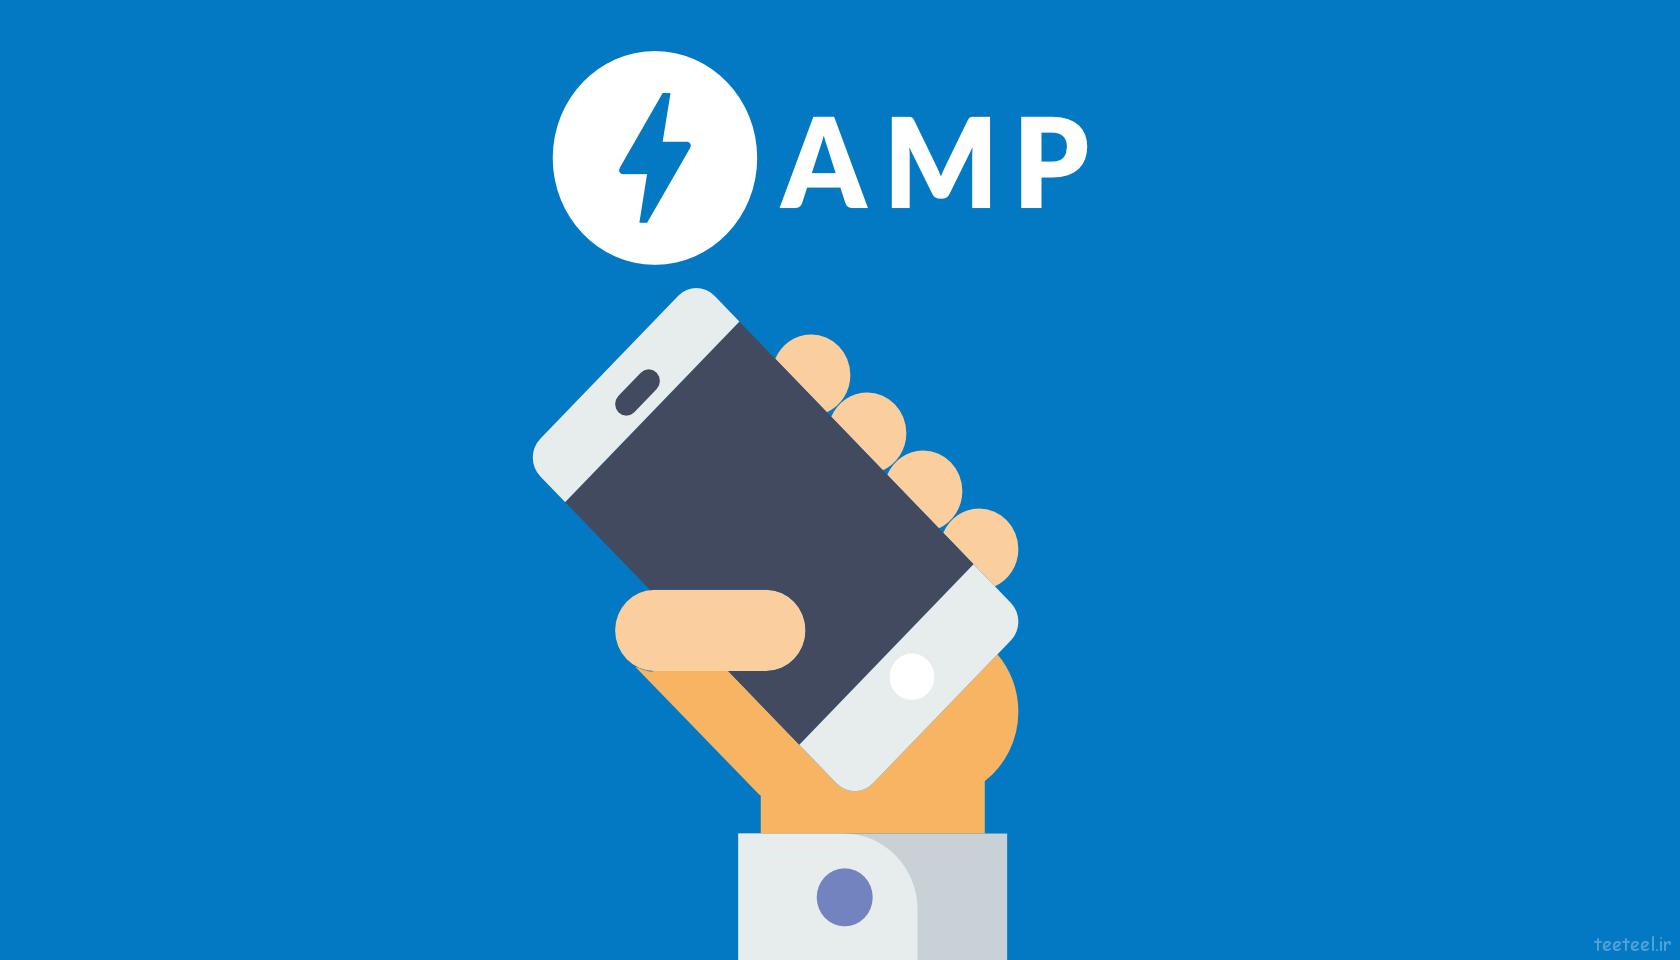 amp و تاثیر آن روی موبایل